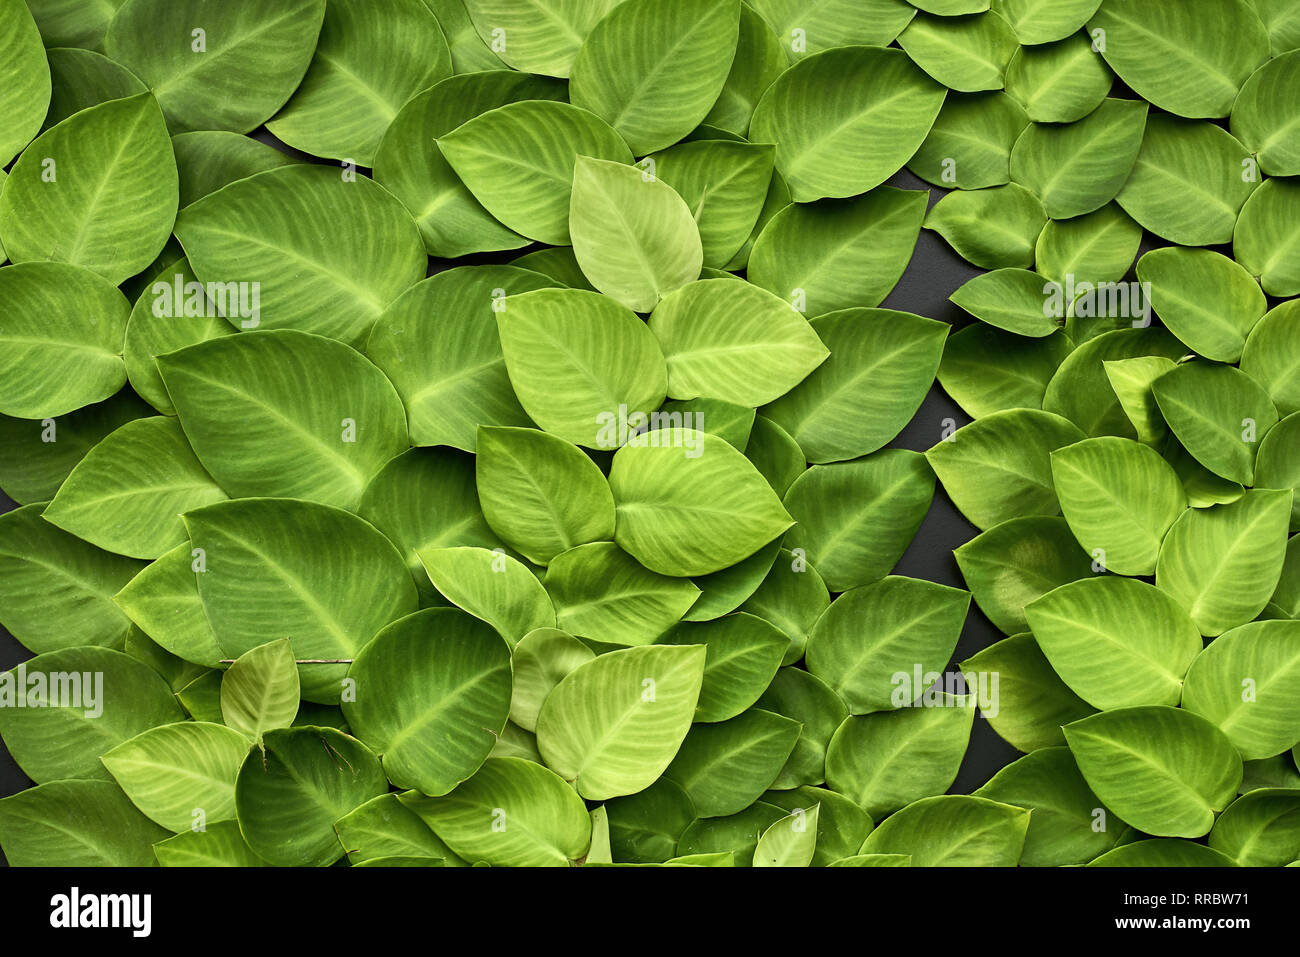 Bright Green Leaves Of Creeper Plants On The Dark Wall Closeup Horizontal Photo Stock Photo Alamy